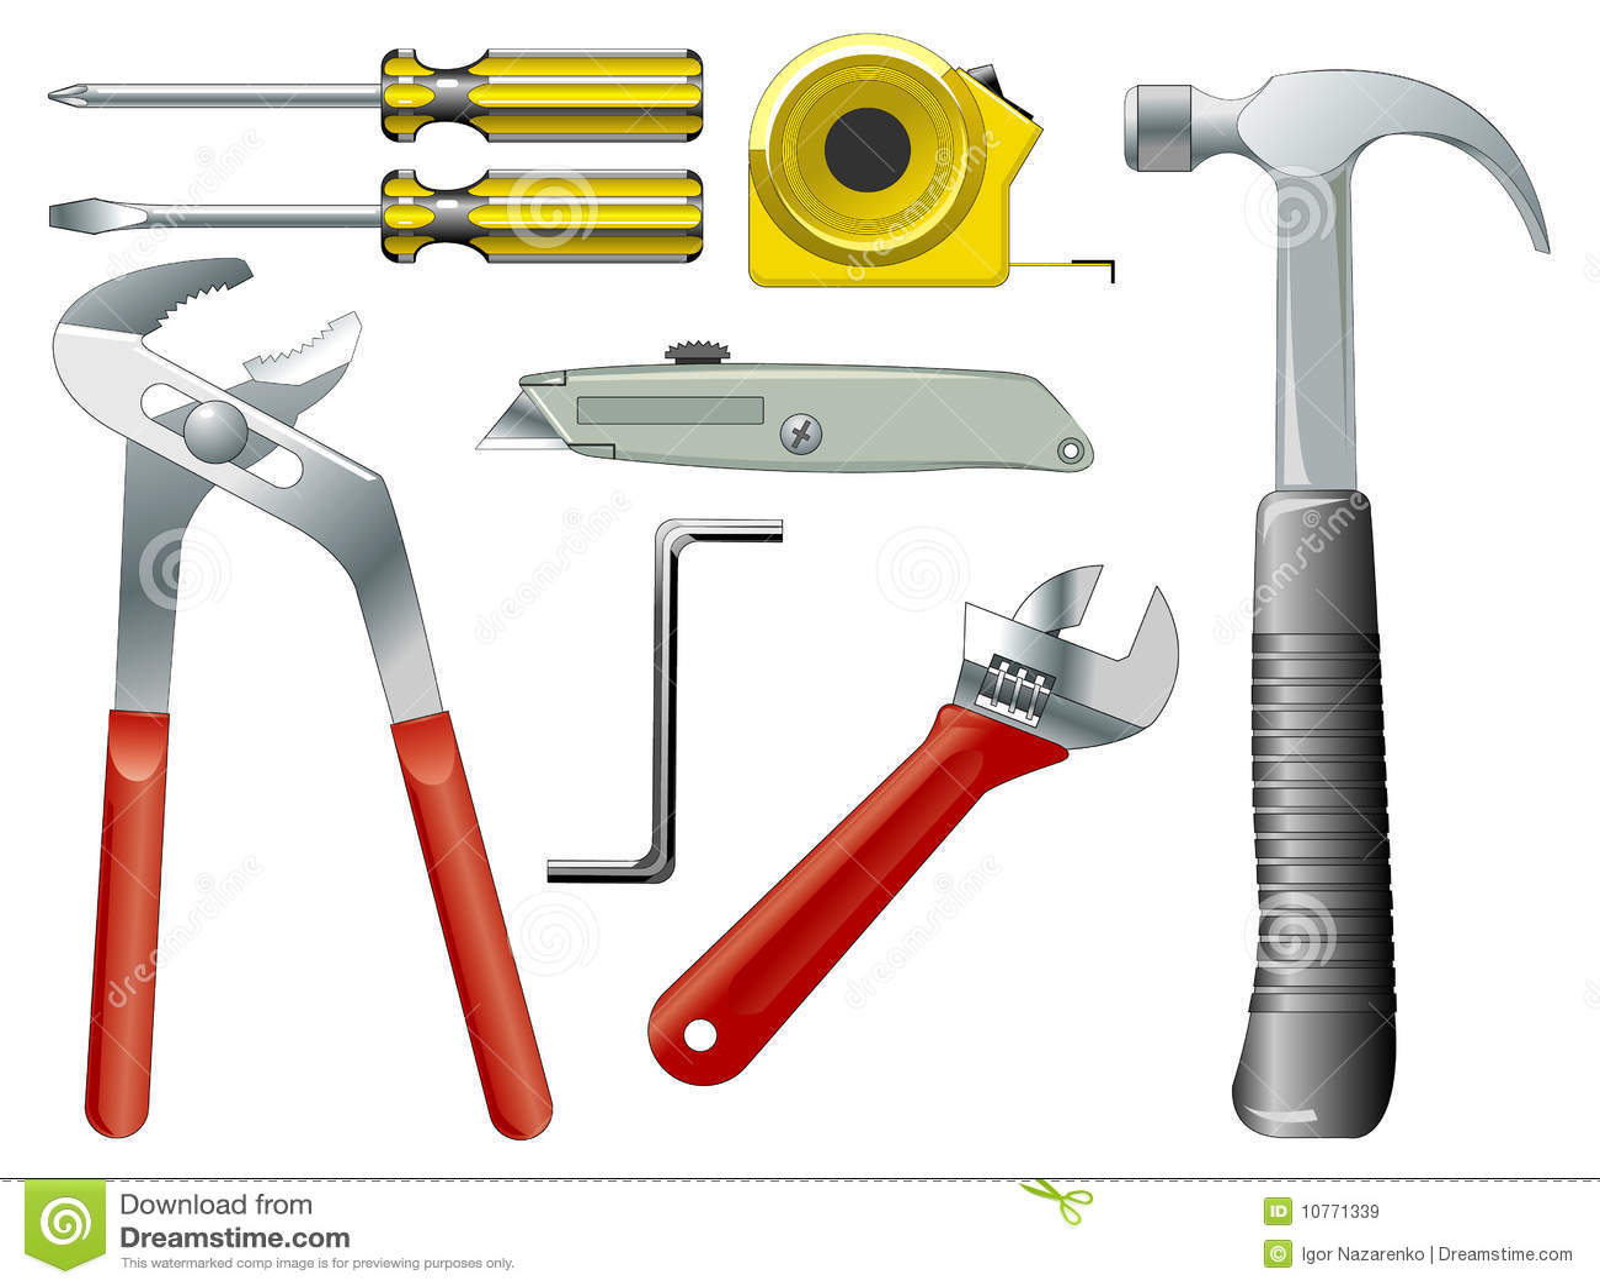 Work tools stock vector. Illustration of illustration - 10771339